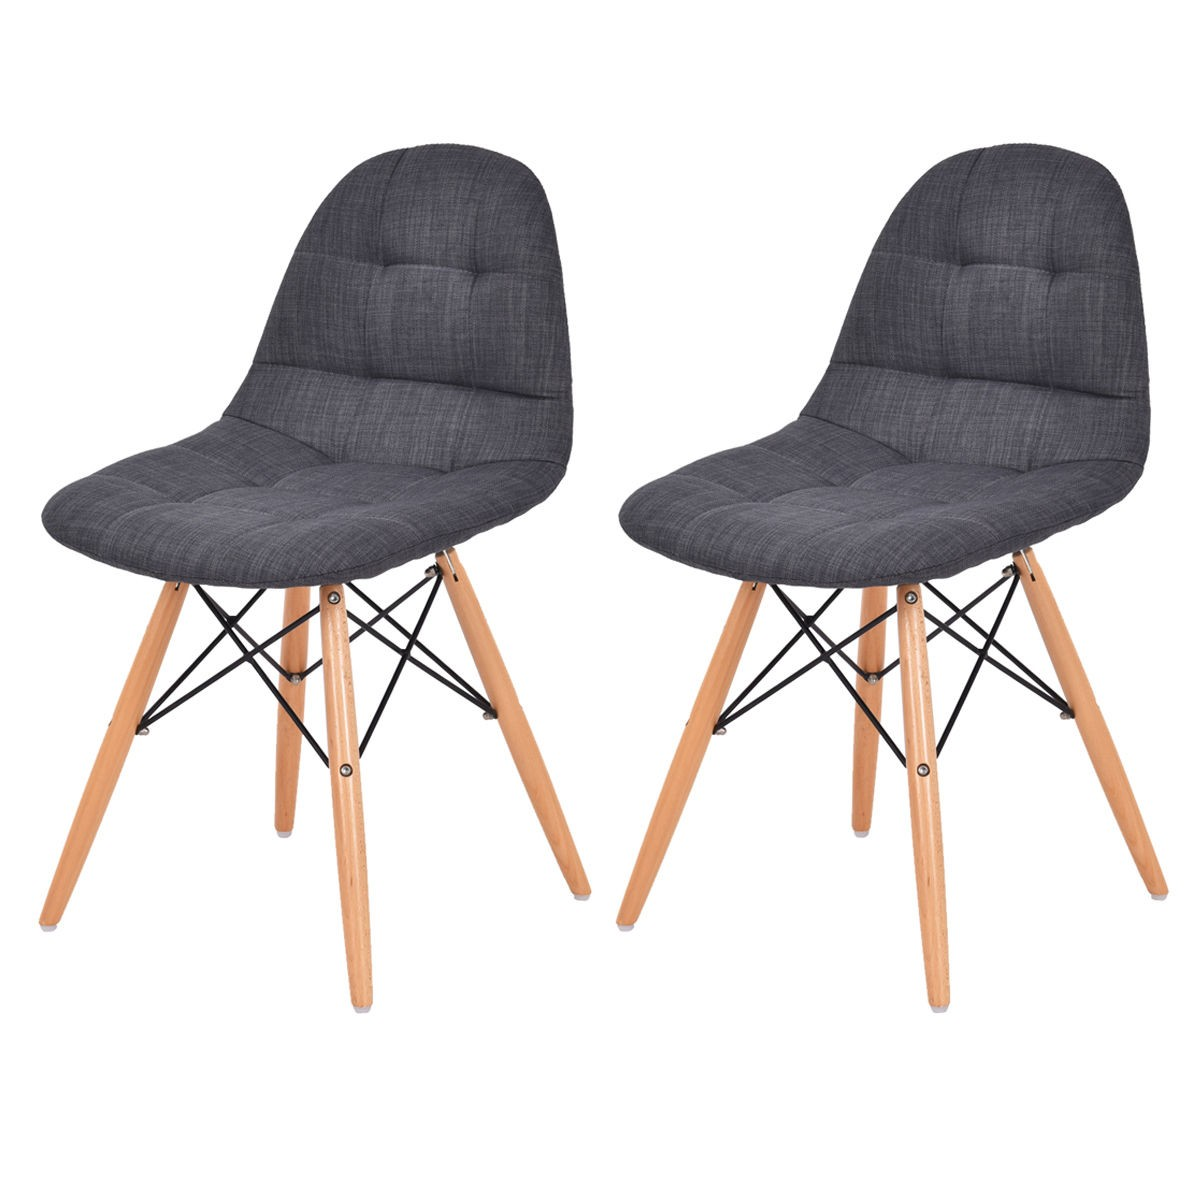 2pc set mid century modern style upholstered dsw dining for Modern upholstered dining chairs